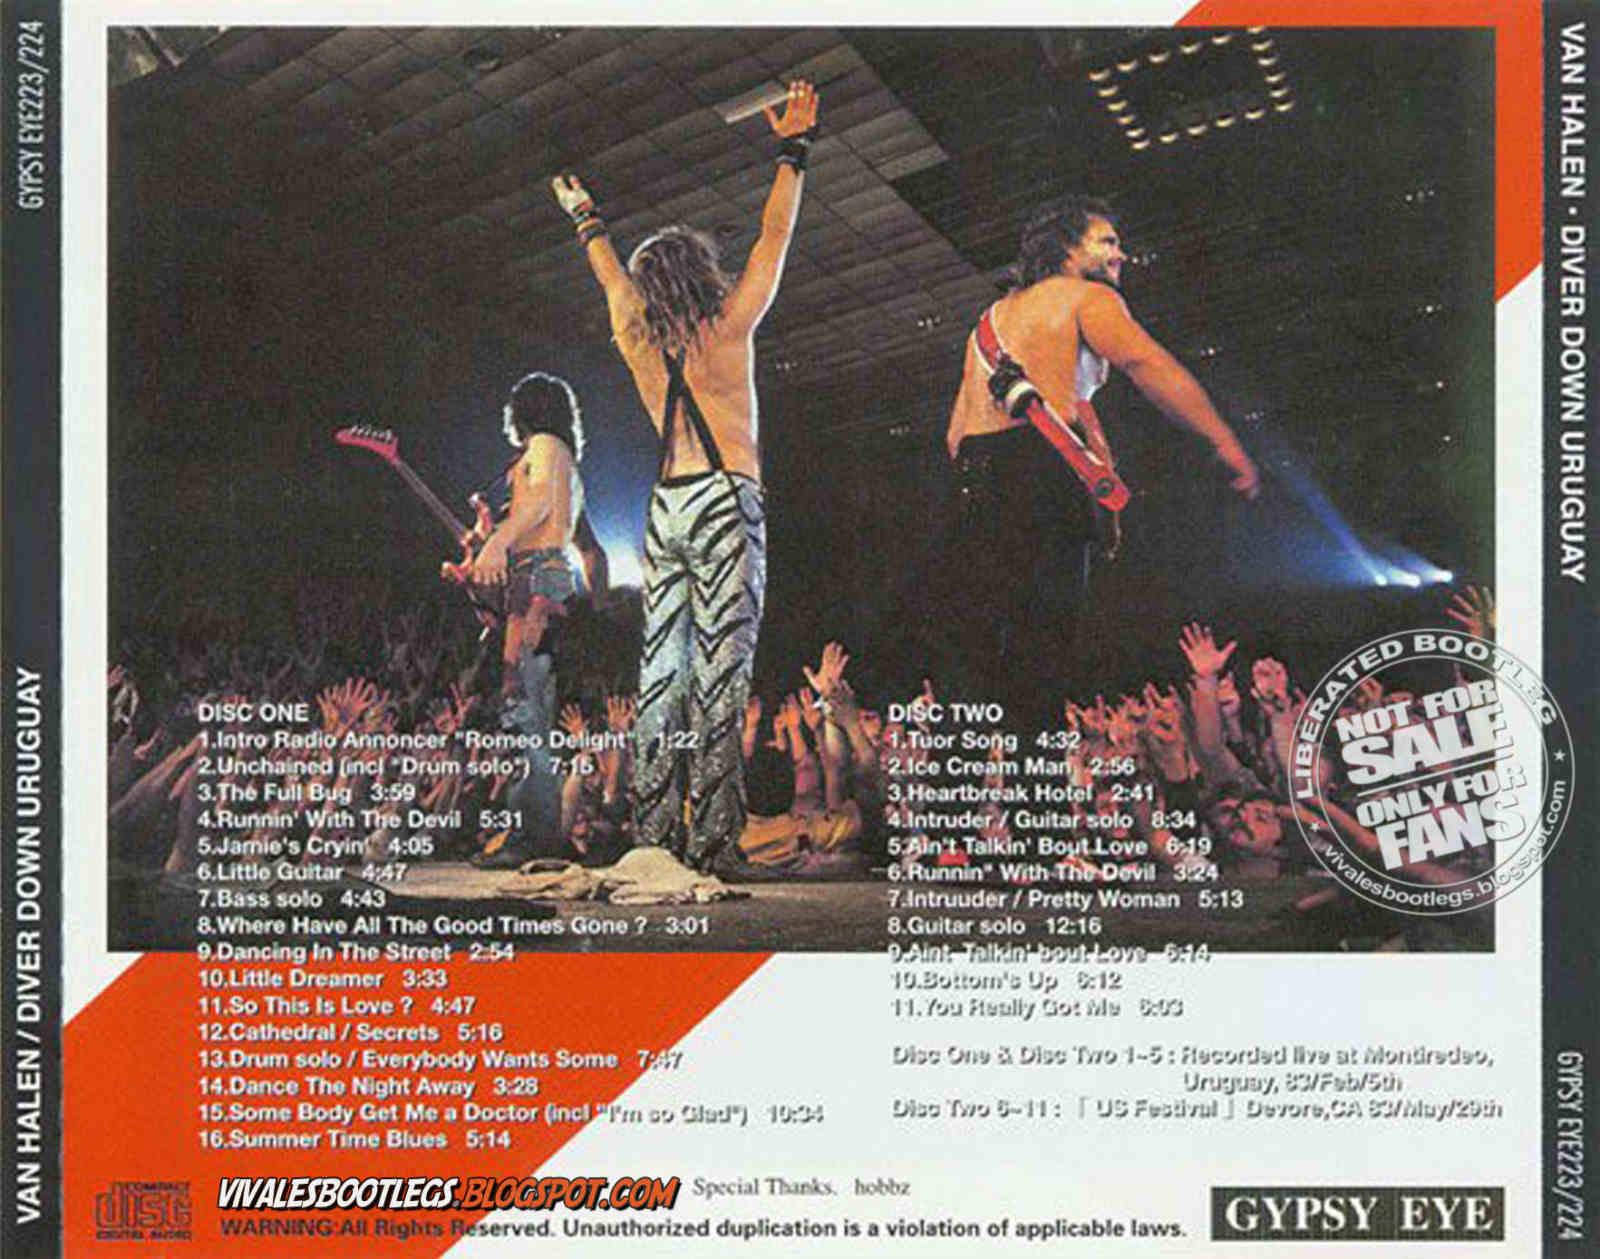 Viva Les Bootlegs Van Halen Diver Down Uruguay Montevideo Uruguay Cilindro Municipal 1983 02 05 Double Cd Soundboard Gypsy Eye Flac